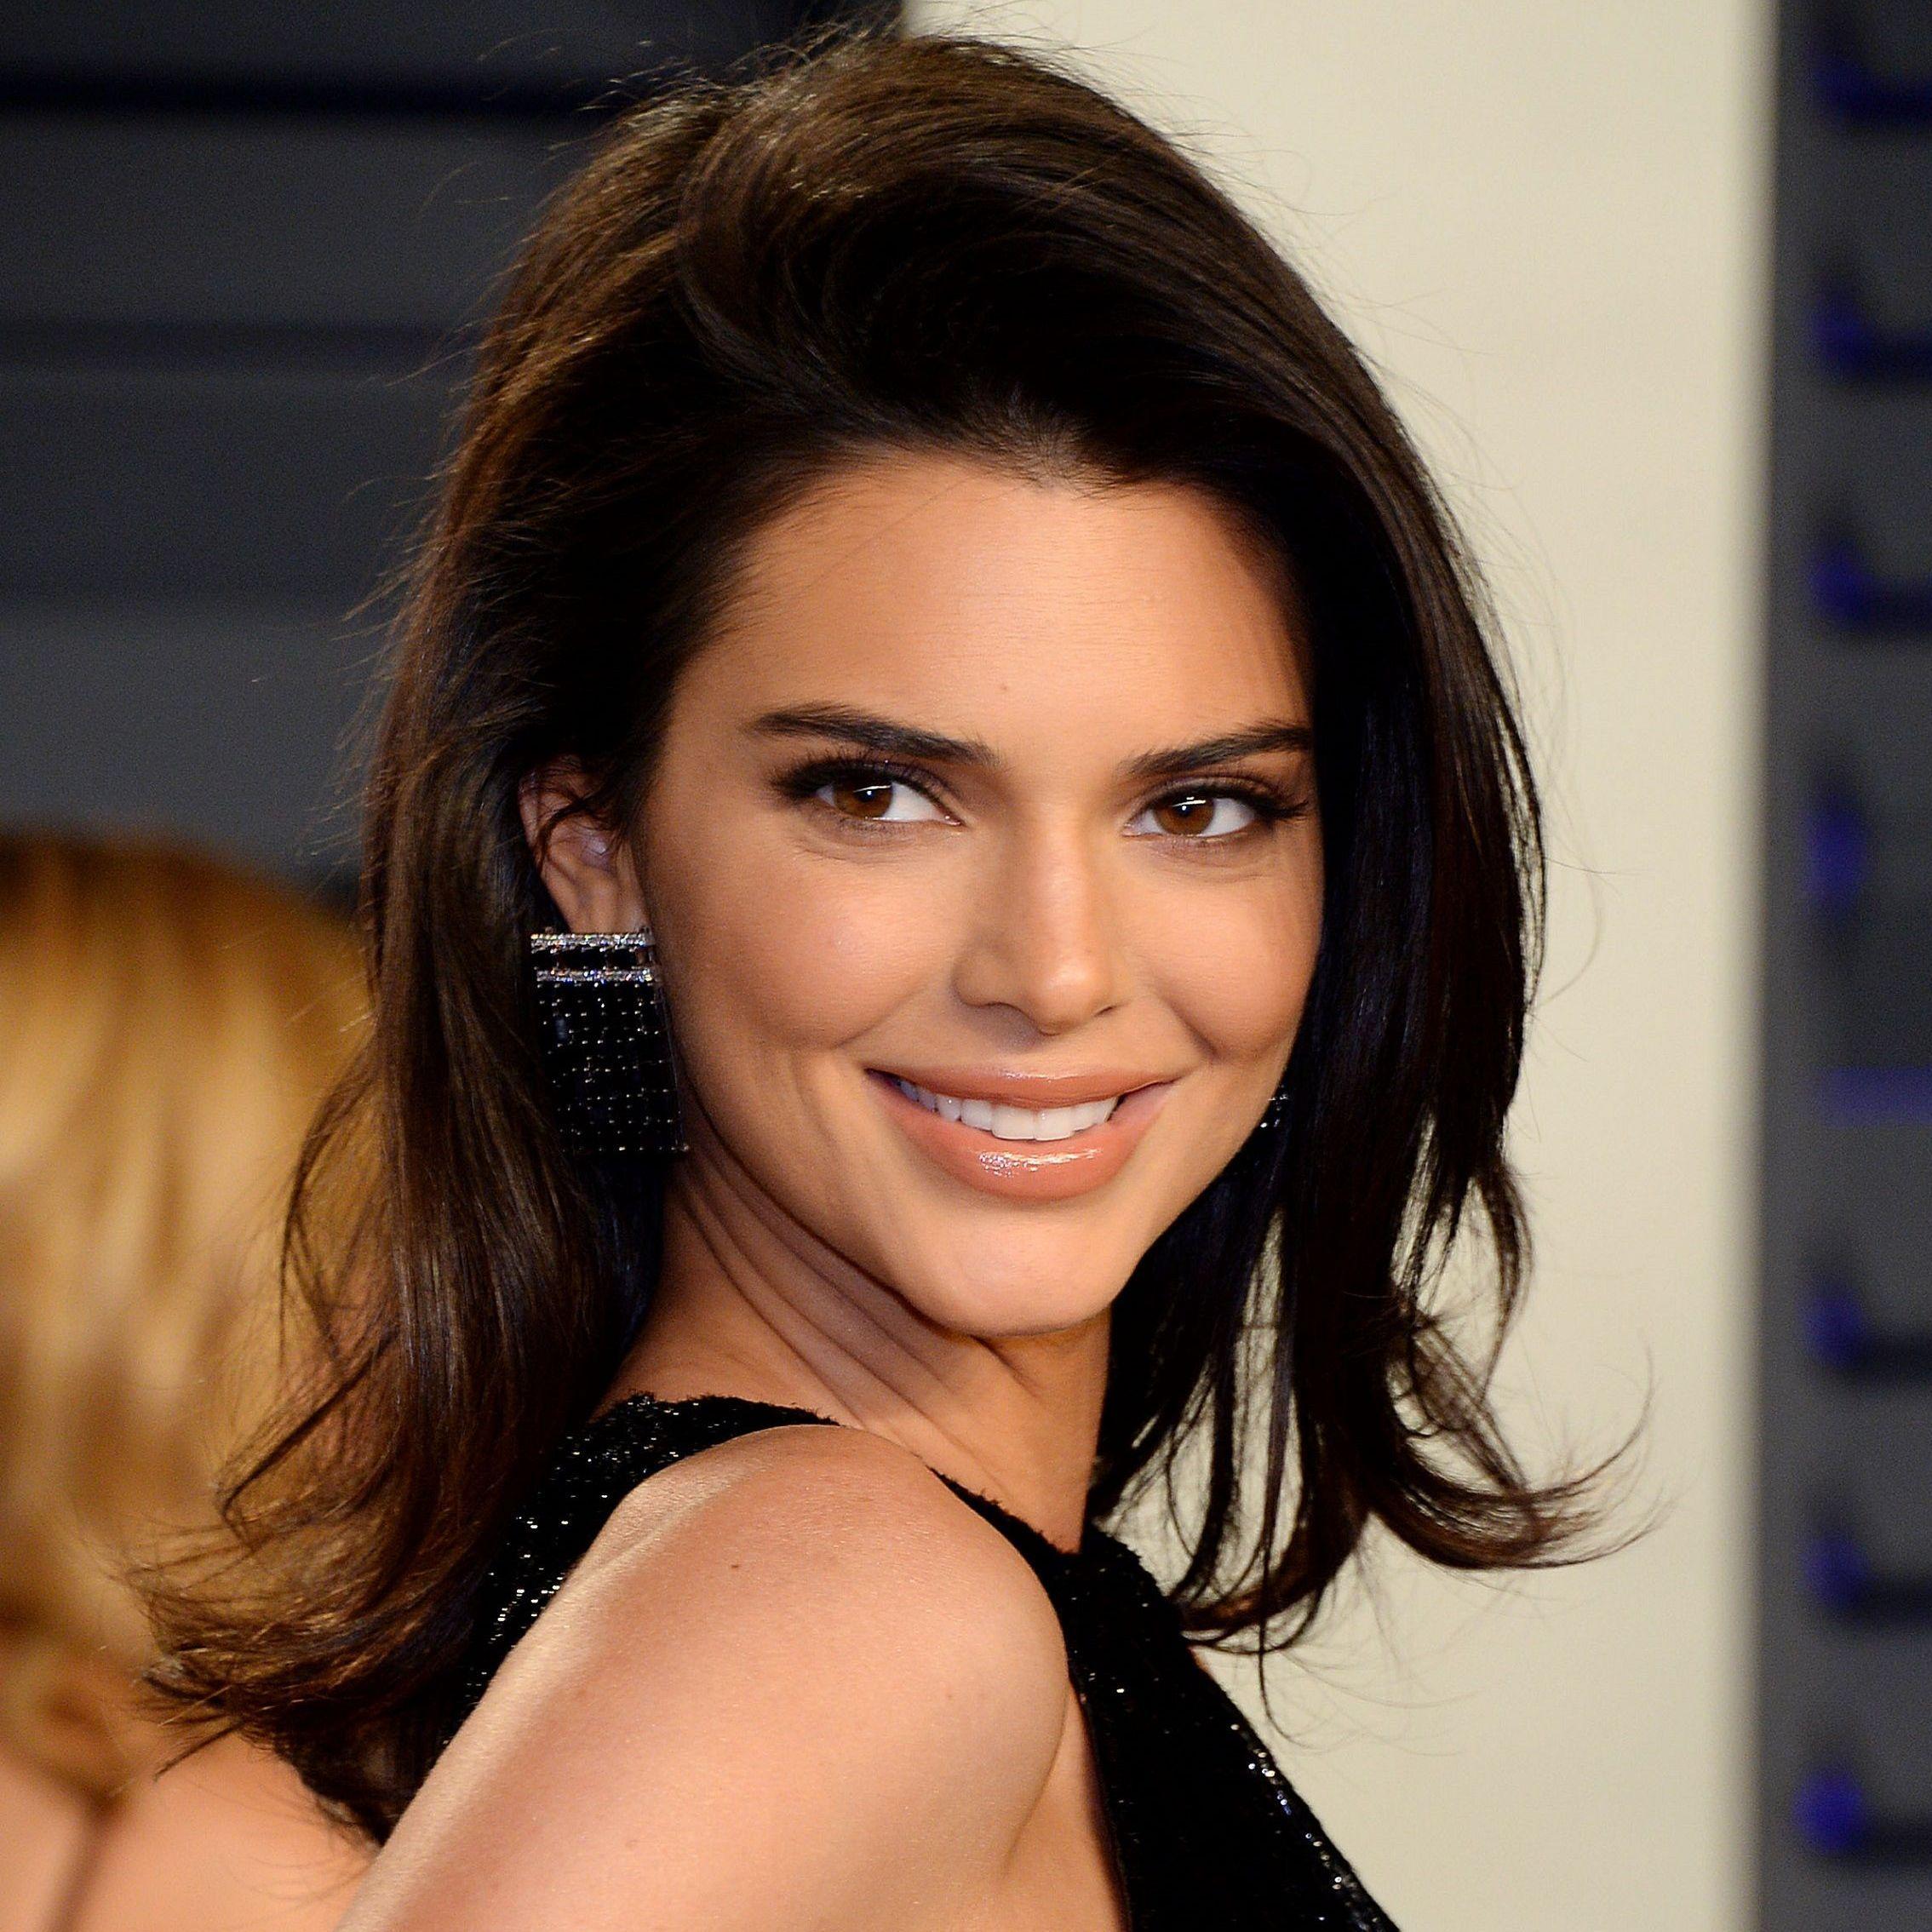 78 Best Kendall Jenner Images On Pinterest: Kendall Jenner : Pourquoi Elle Ne Coupera Jamais Ses